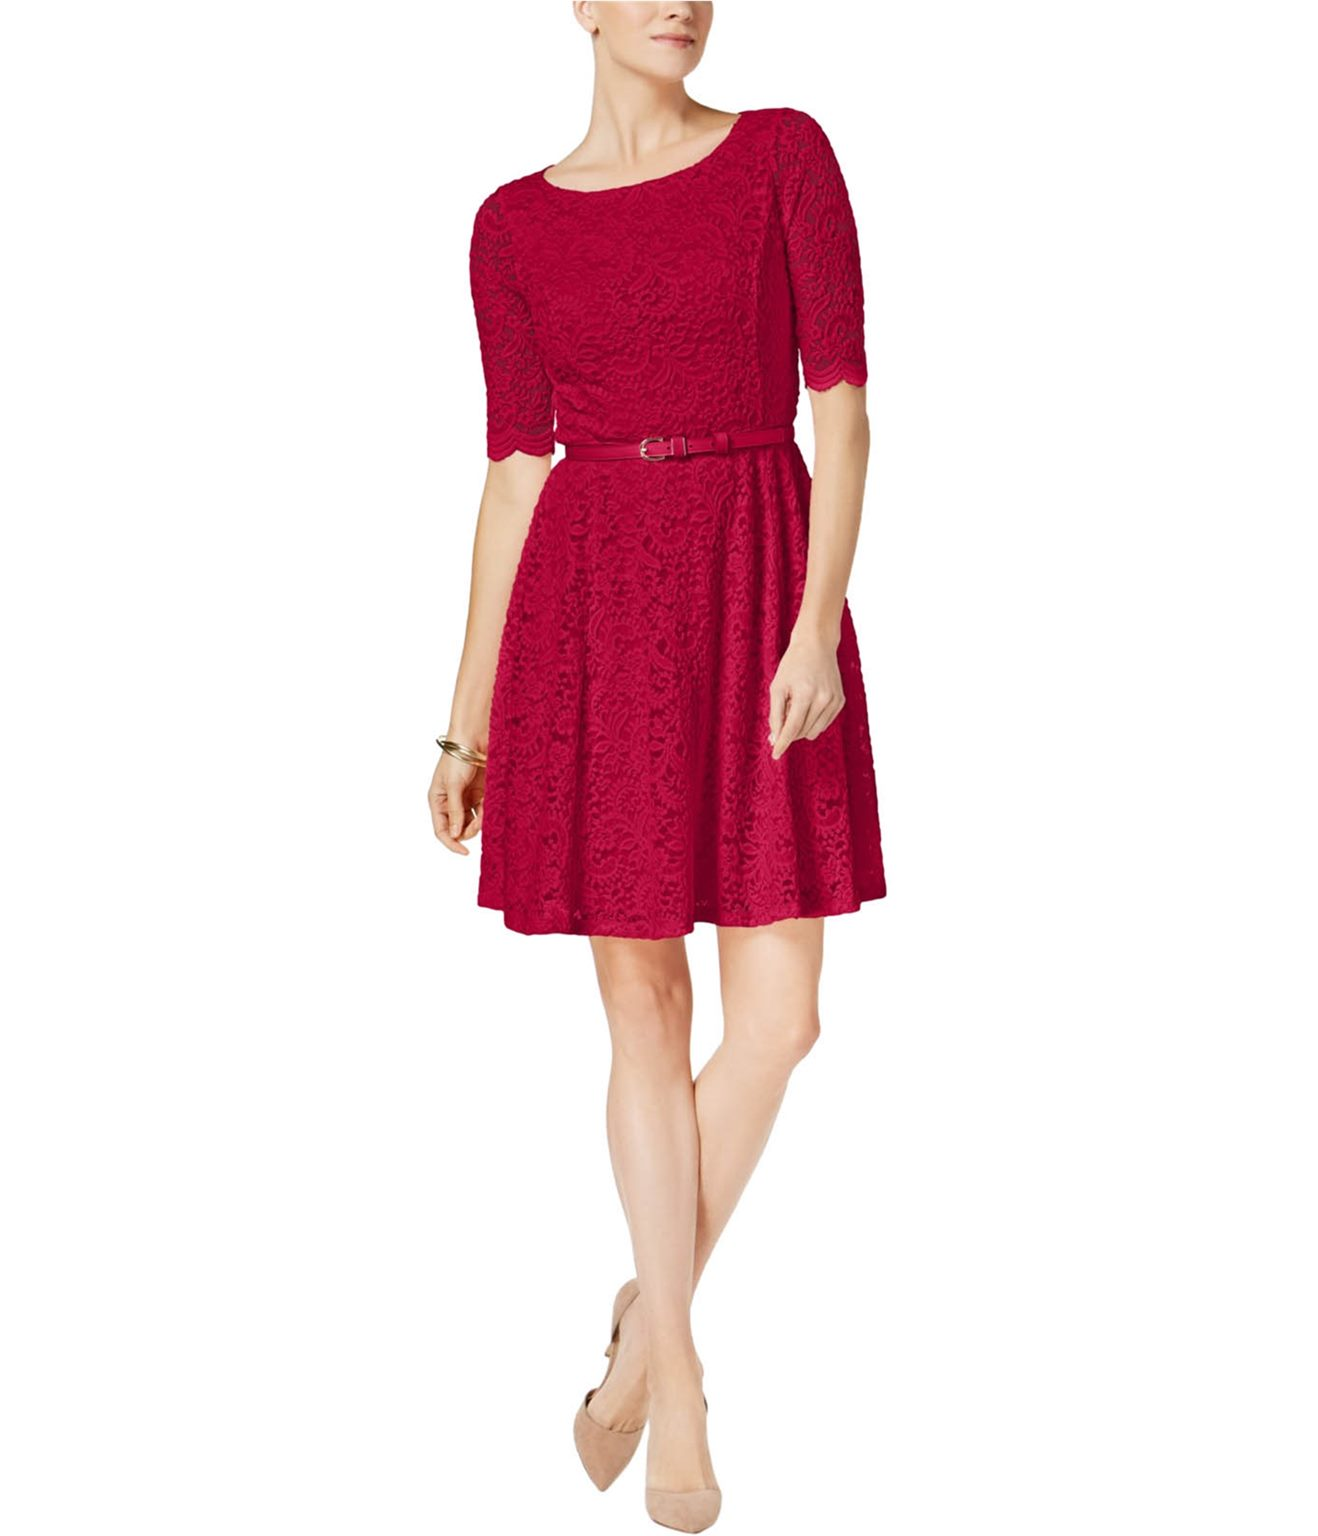 5b769460958e7 Charter Club Womens Lace A-line Fit & Flare Dress | Trade Me